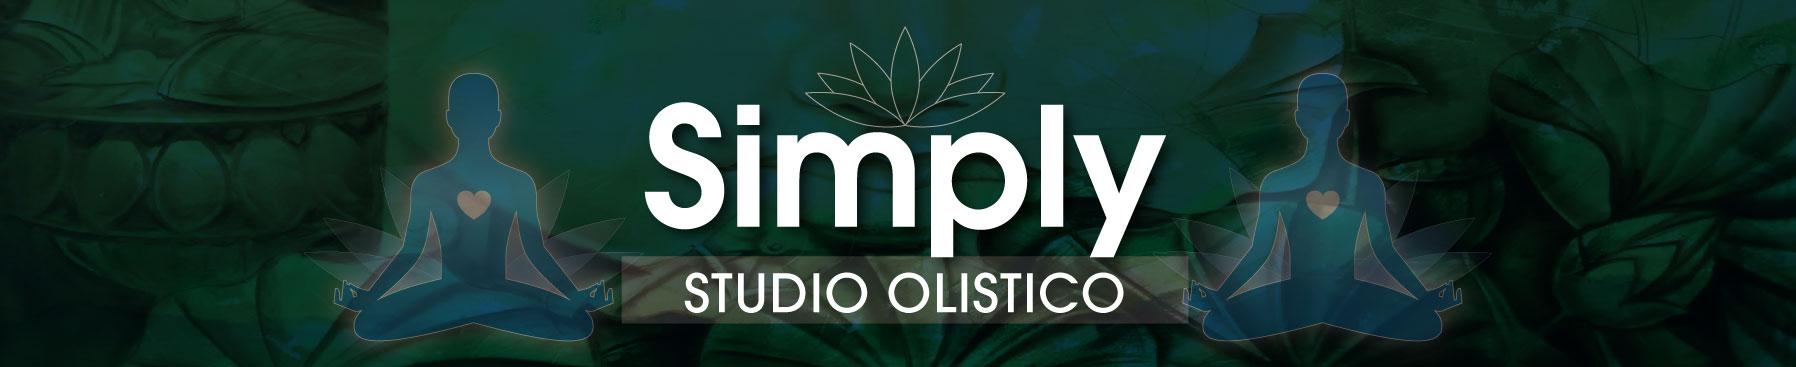 https://meditaedanza.com/wp-content/uploads/2020/11/header-studio-olistico.jpg